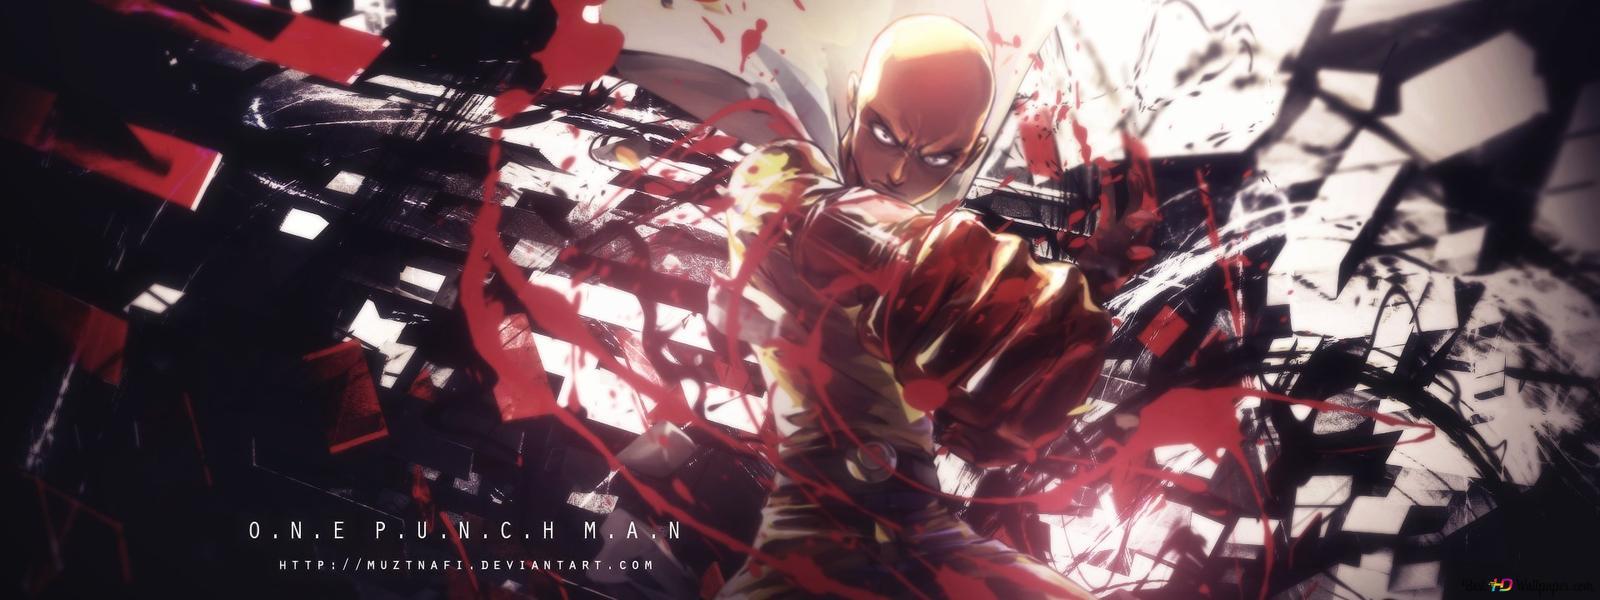 One Punch Man Saitama Wallpaper Hd Wallpaper Download